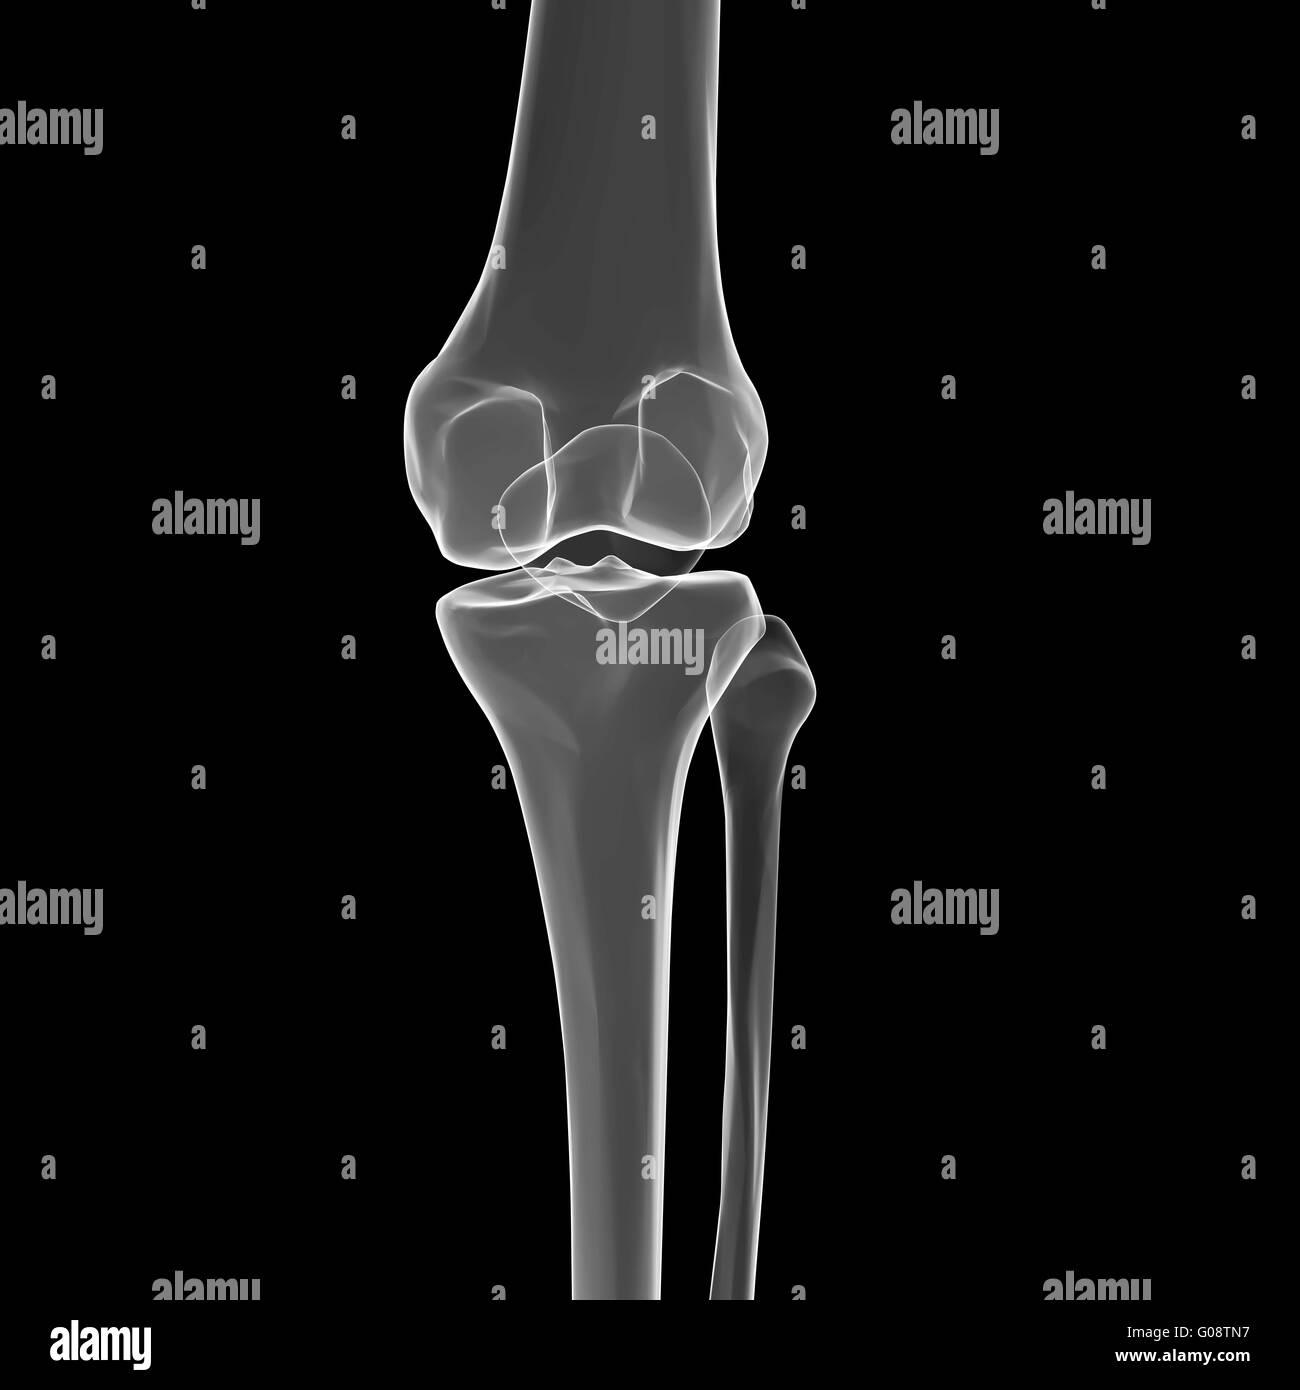 Fibula Bone Imágenes De Stock & Fibula Bone Fotos De Stock - Alamy